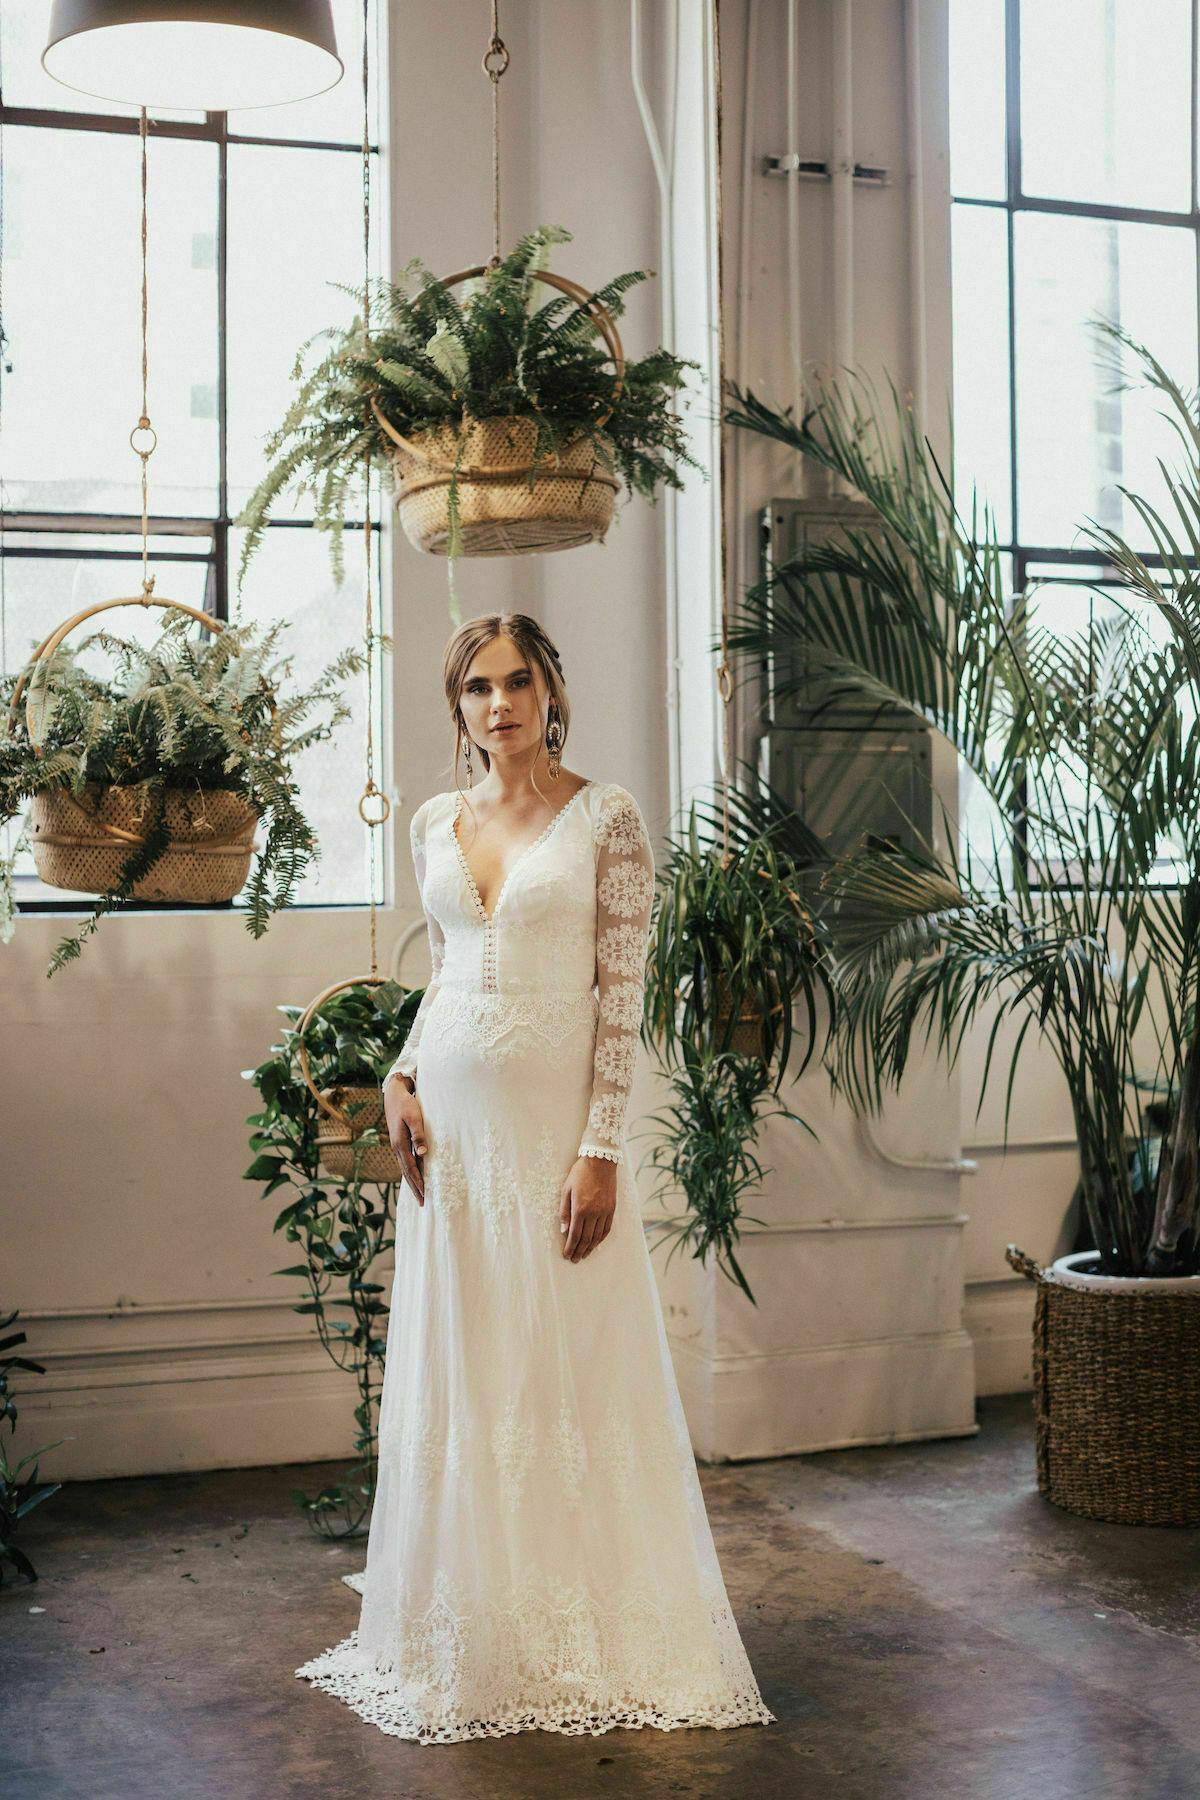 julia-romantic-lace-wedding-dress-vanilla-colored-liner